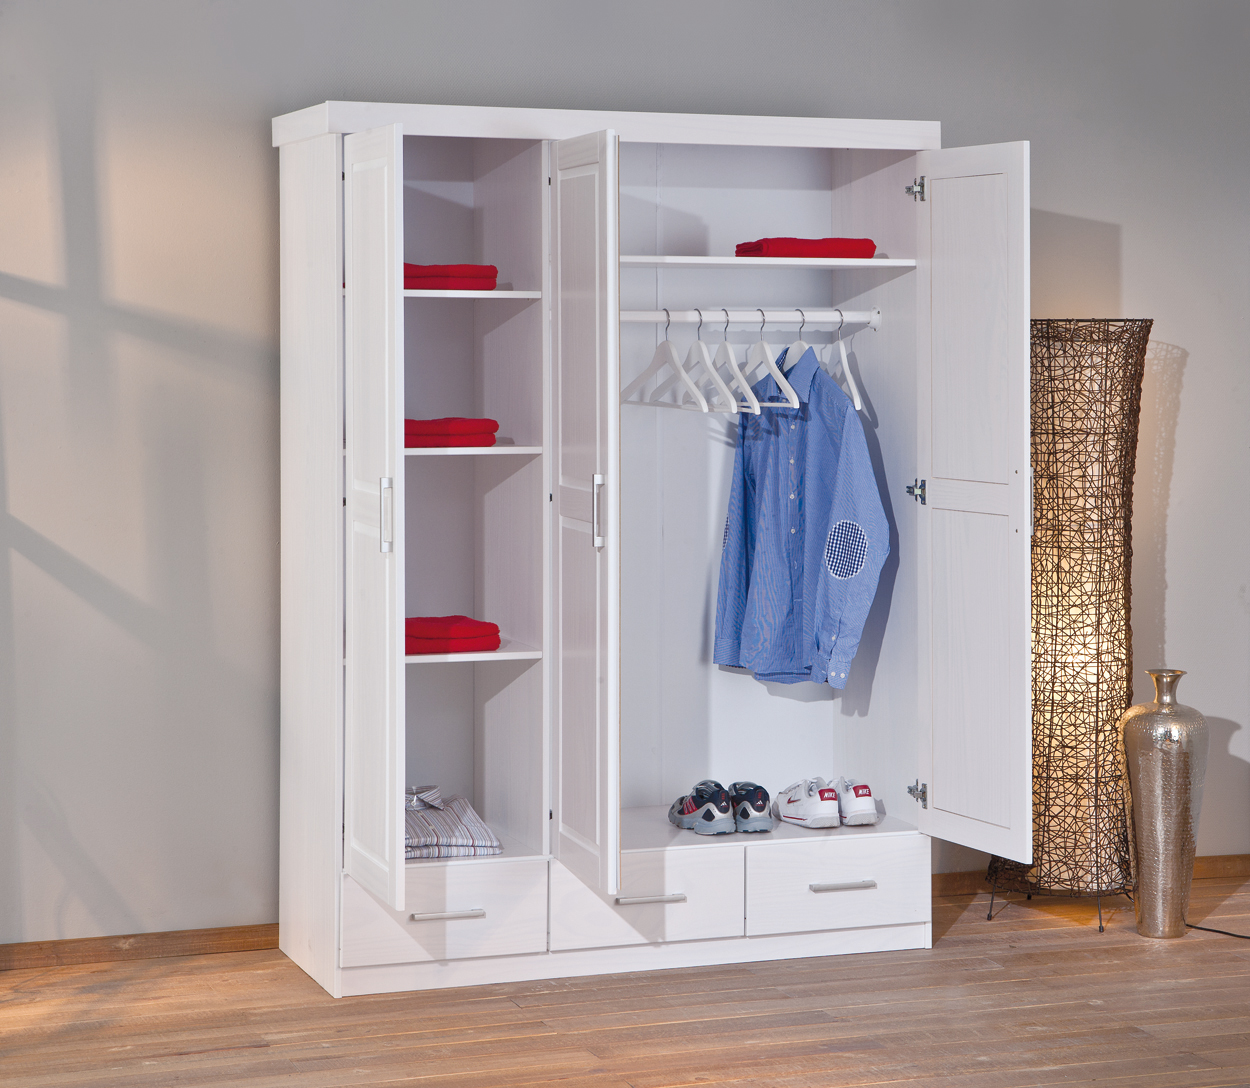 kleiderschrank kaufen cloture oobamboo com. Black Bedroom Furniture Sets. Home Design Ideas